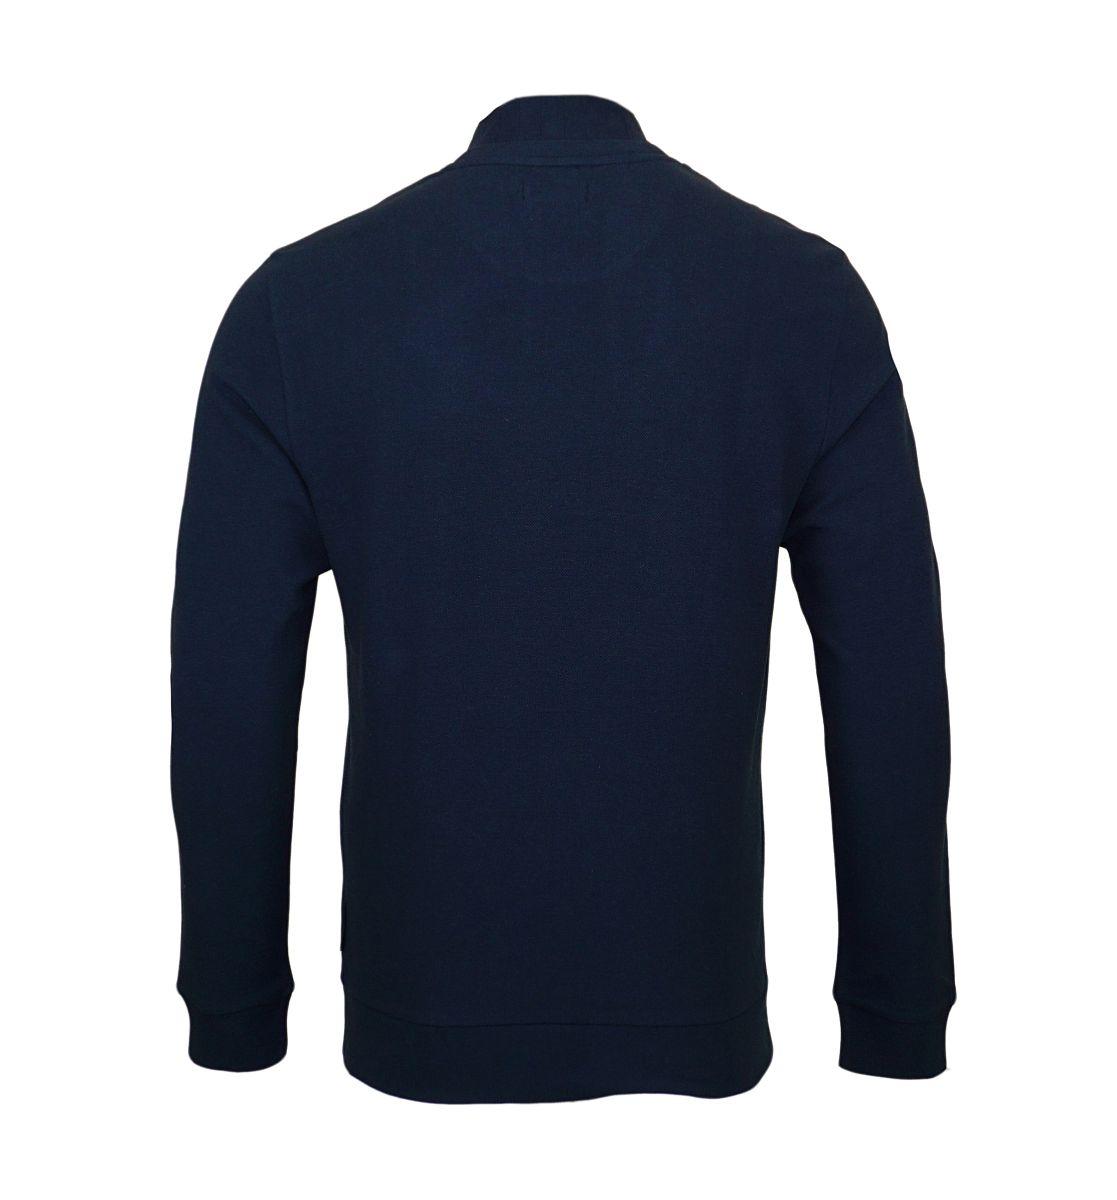 Emporio Armani Sweater Pullover Rundhals 111437 7A569 00135 MARINE HW17-EAS1